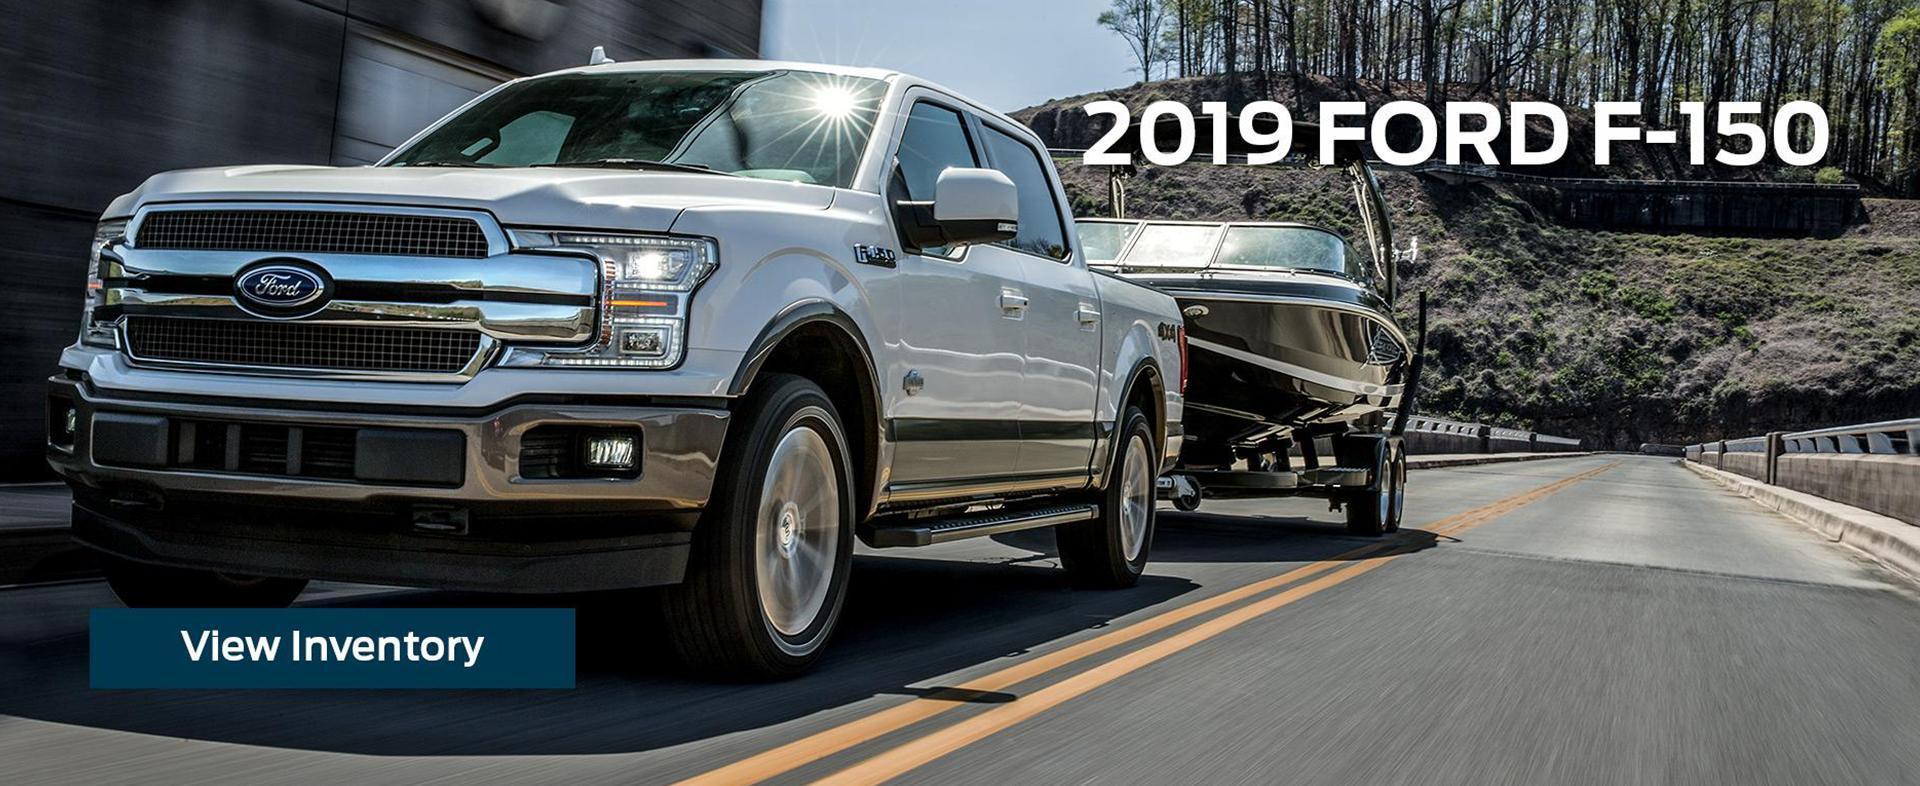 New 2019 Ford F-150 White